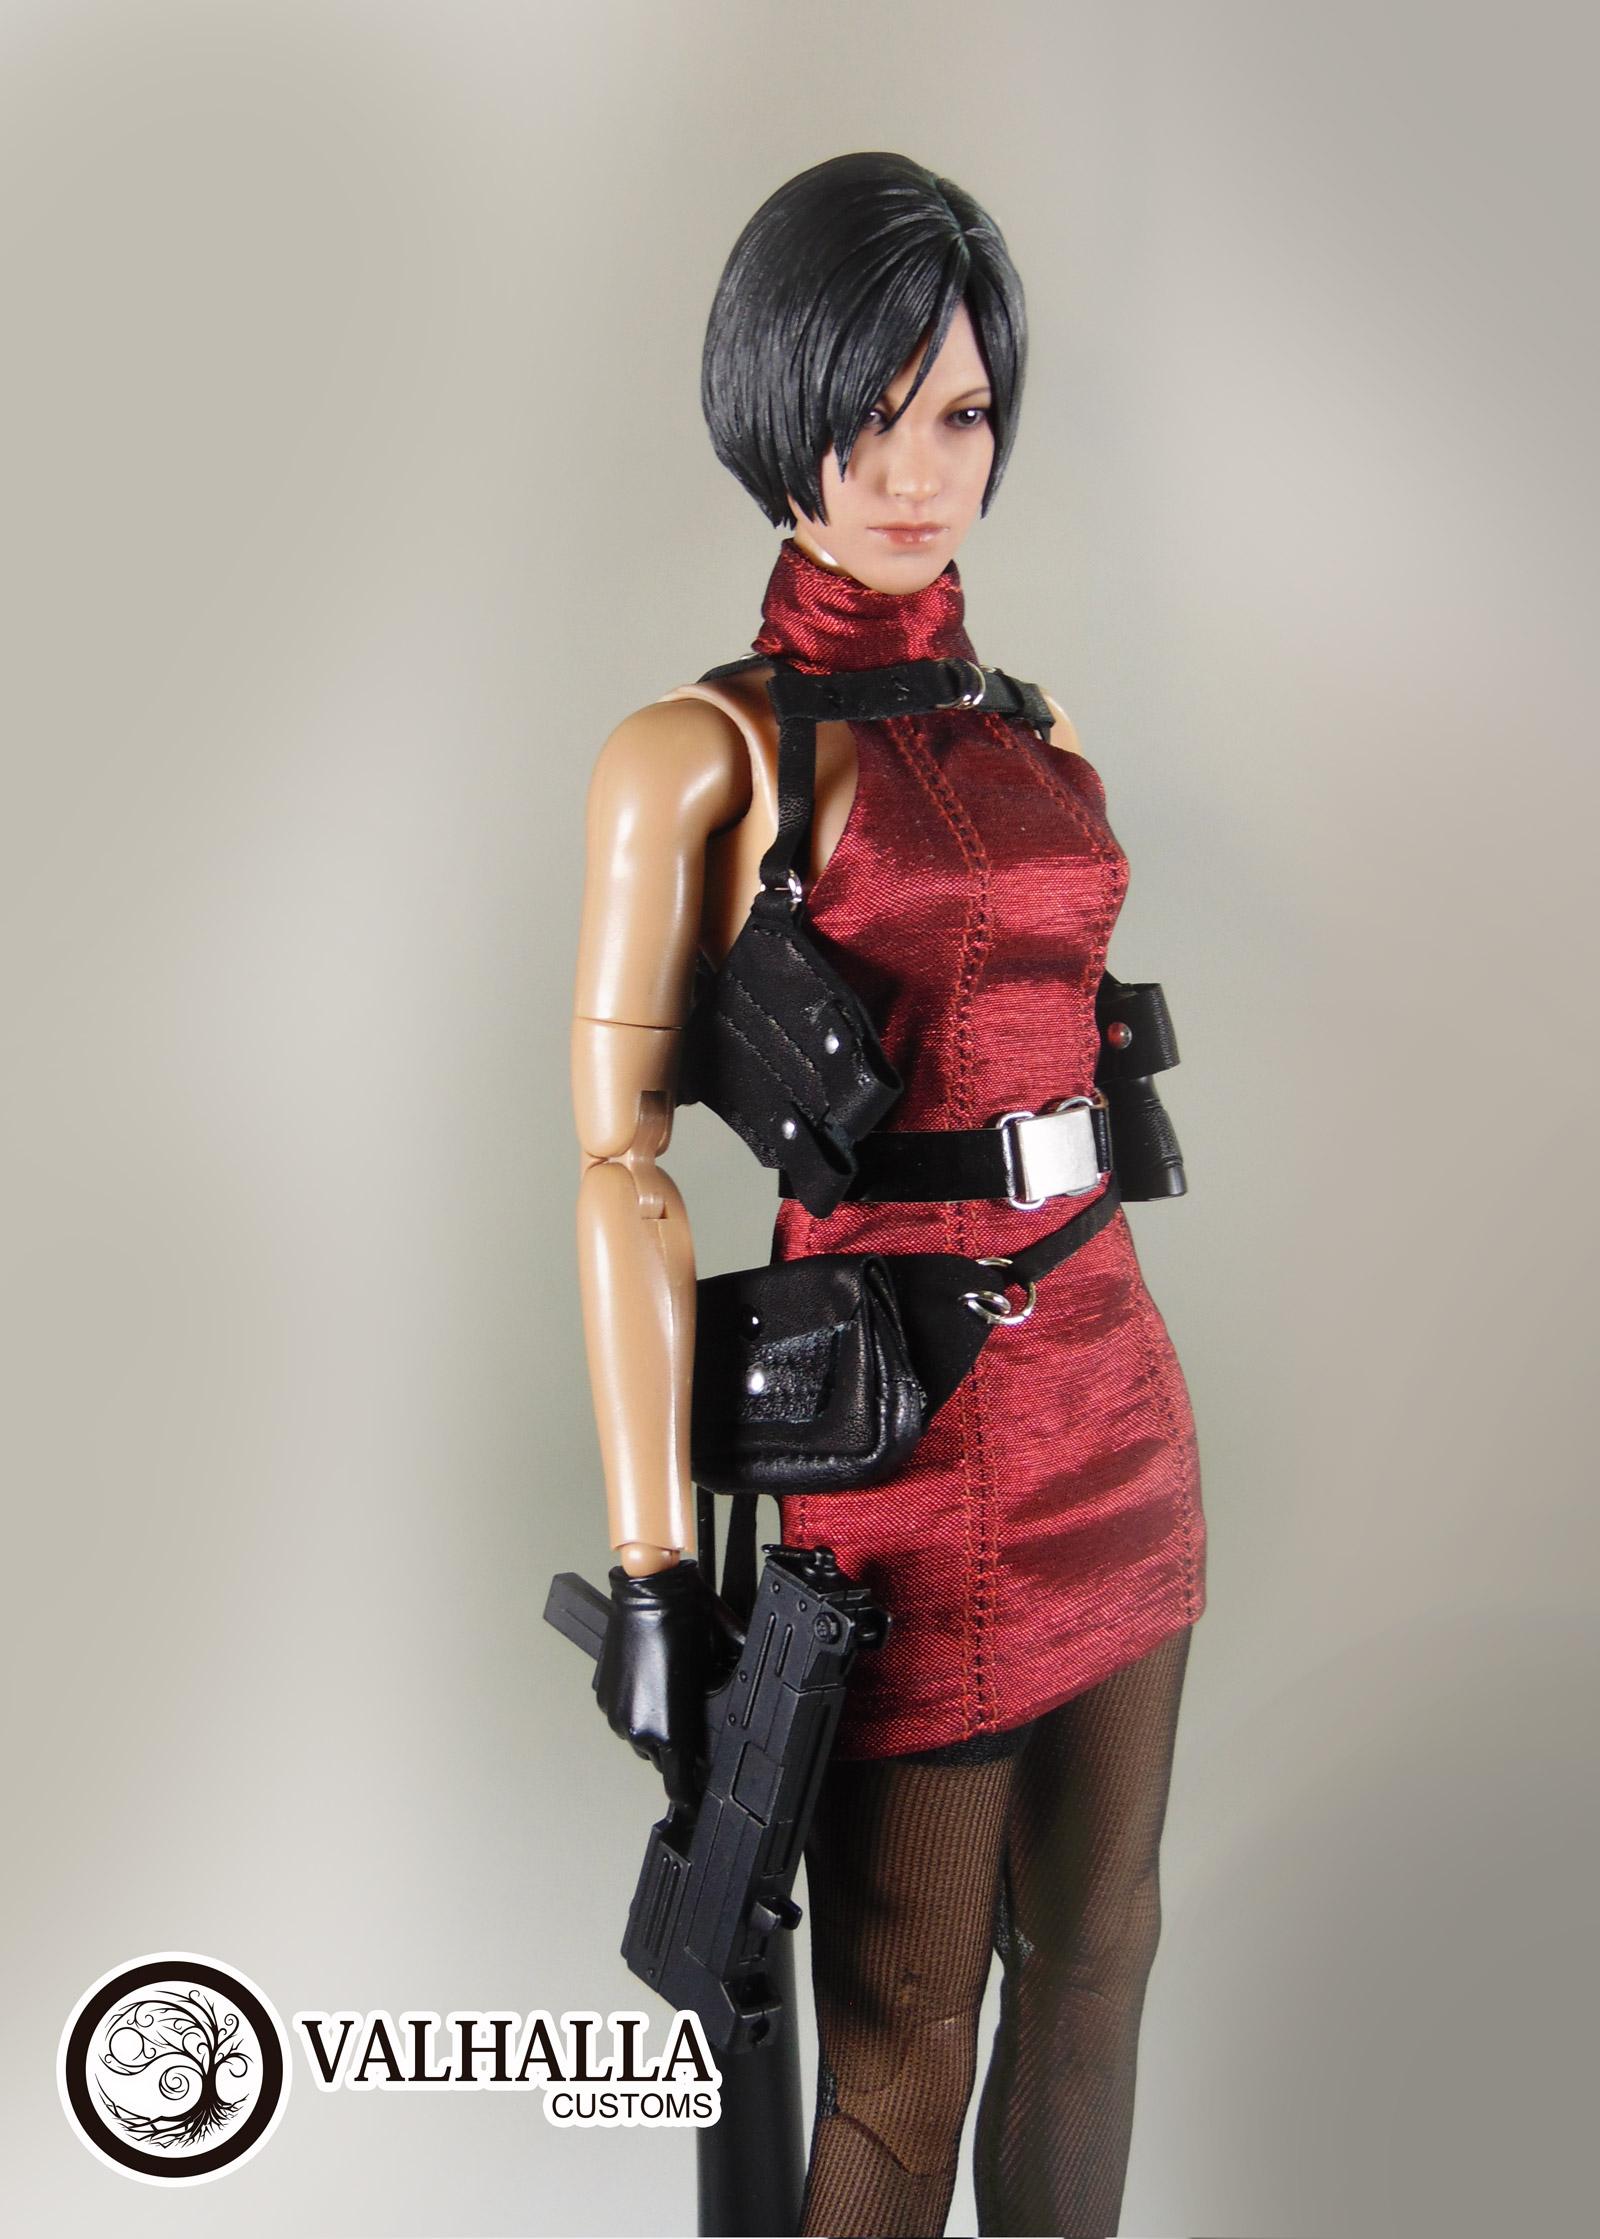 Hot Toys - VGM21 - Resident Evil 6: 1:6 ADA WONG   Figures.com